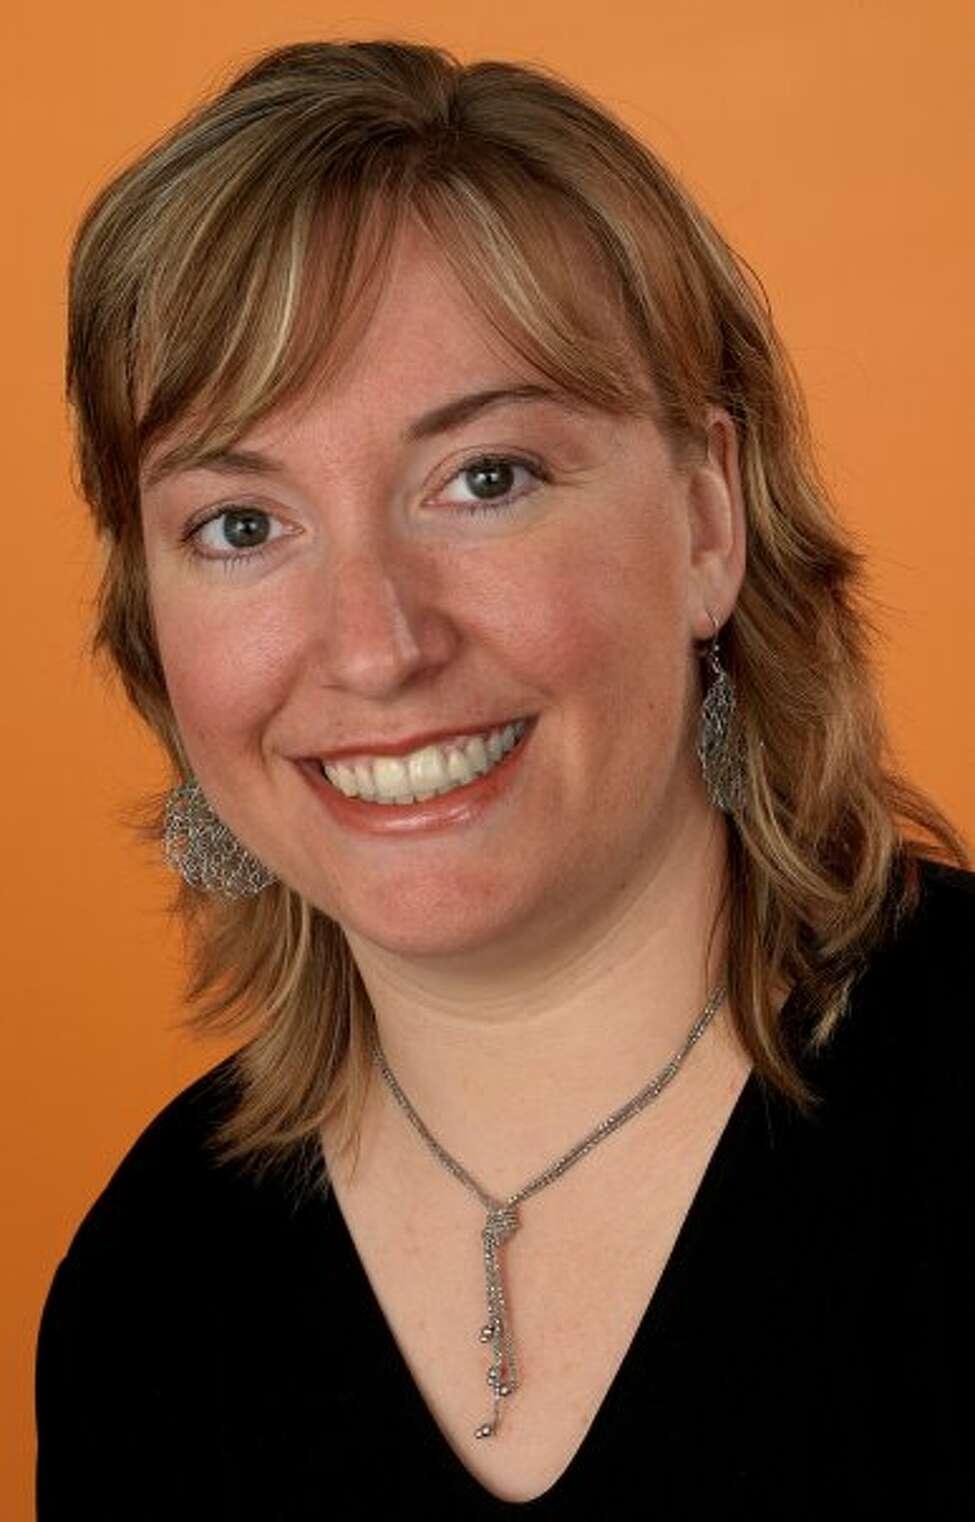 Susan Wenner Jackson, founder of Moms Without Guilt